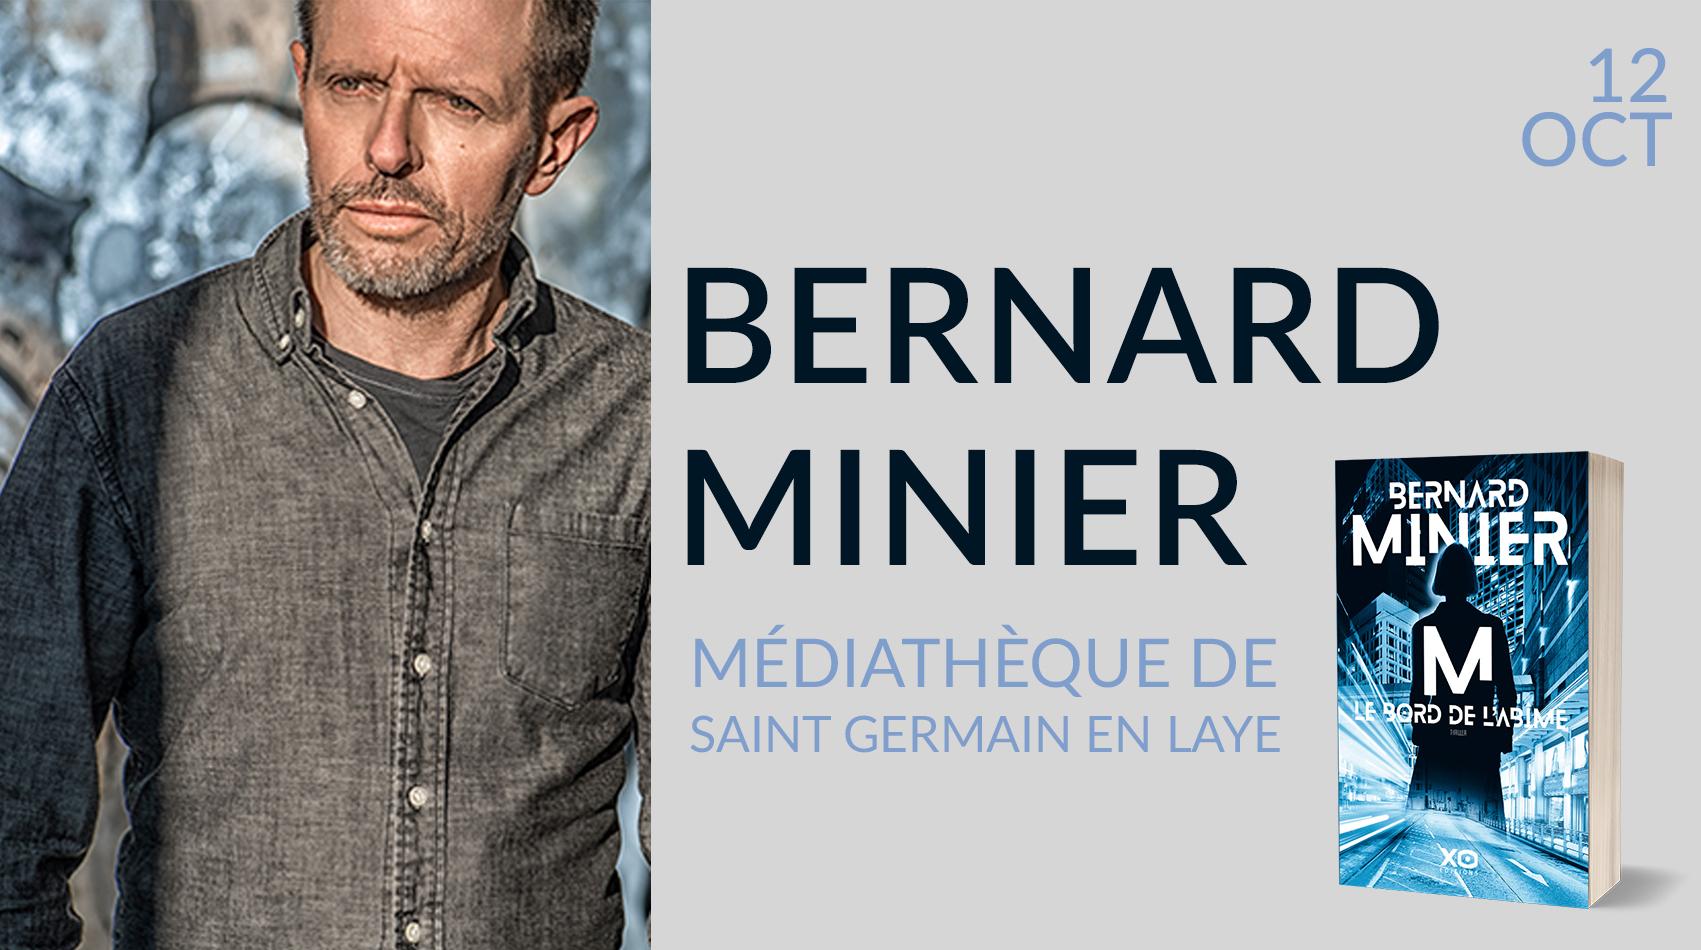 BERNARD MINIER À SAINT GERMAIN EN LAYE